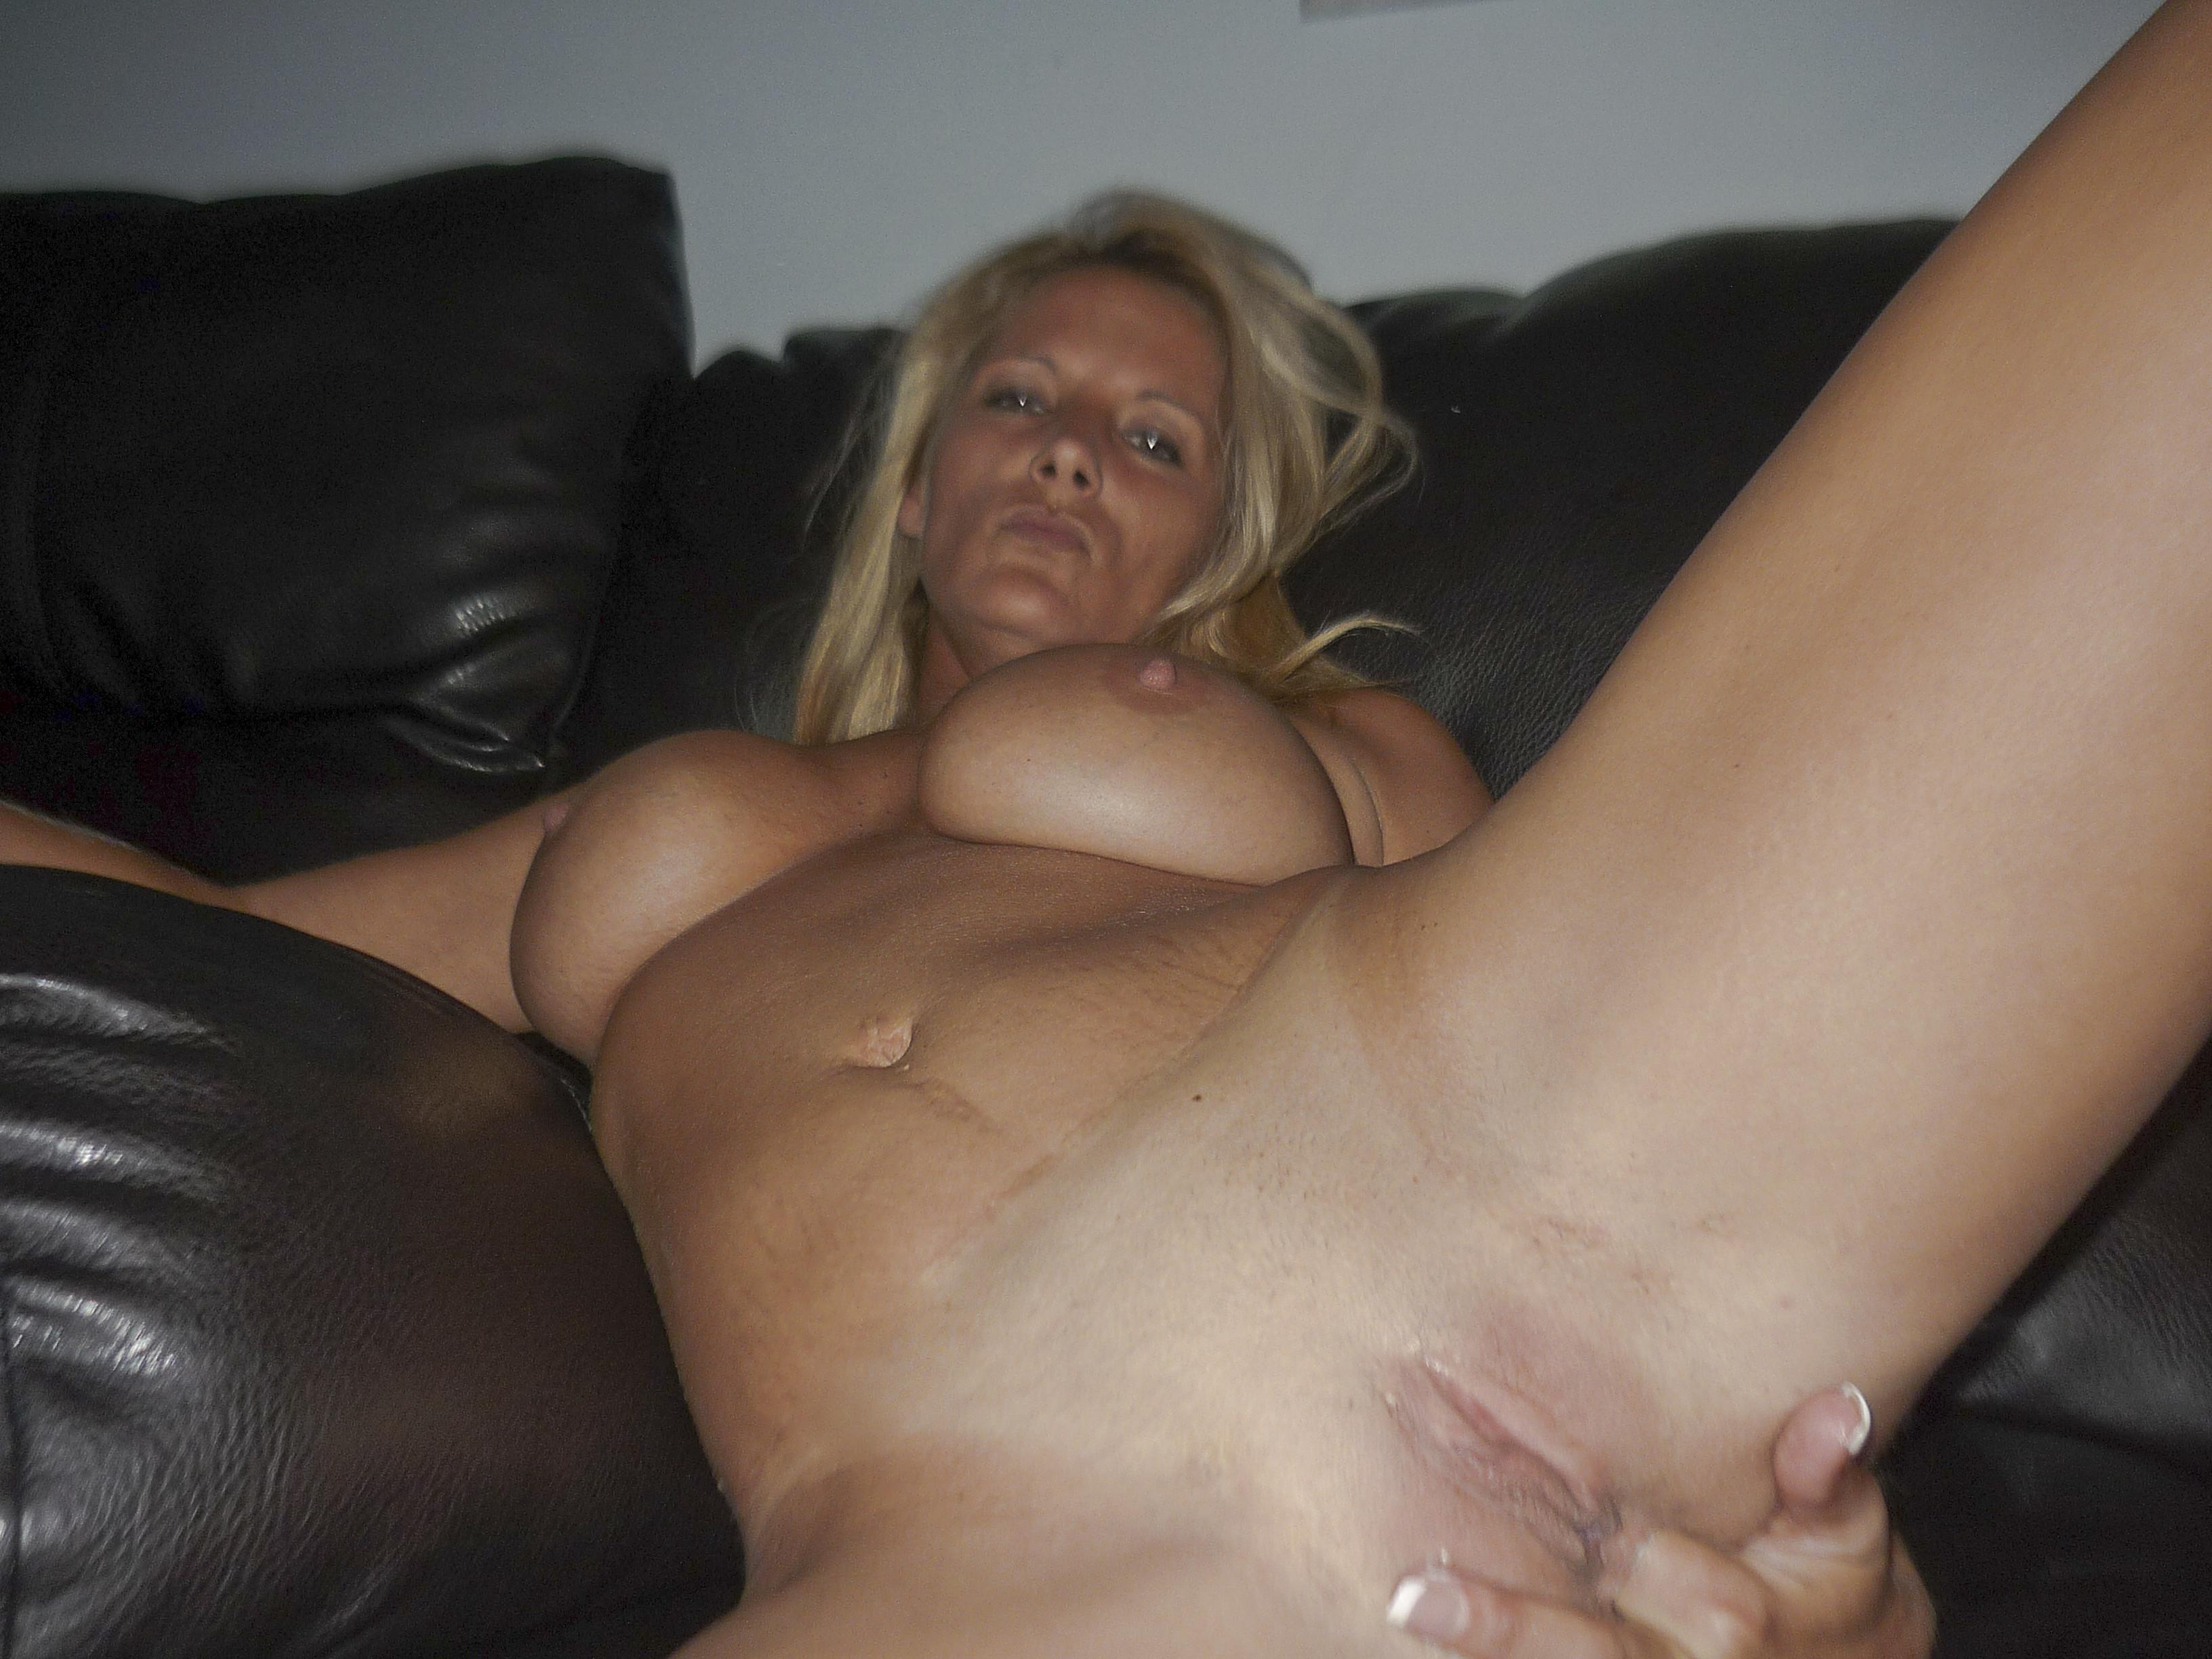 Incredible pornstar in exotic blonde, mature adult scene